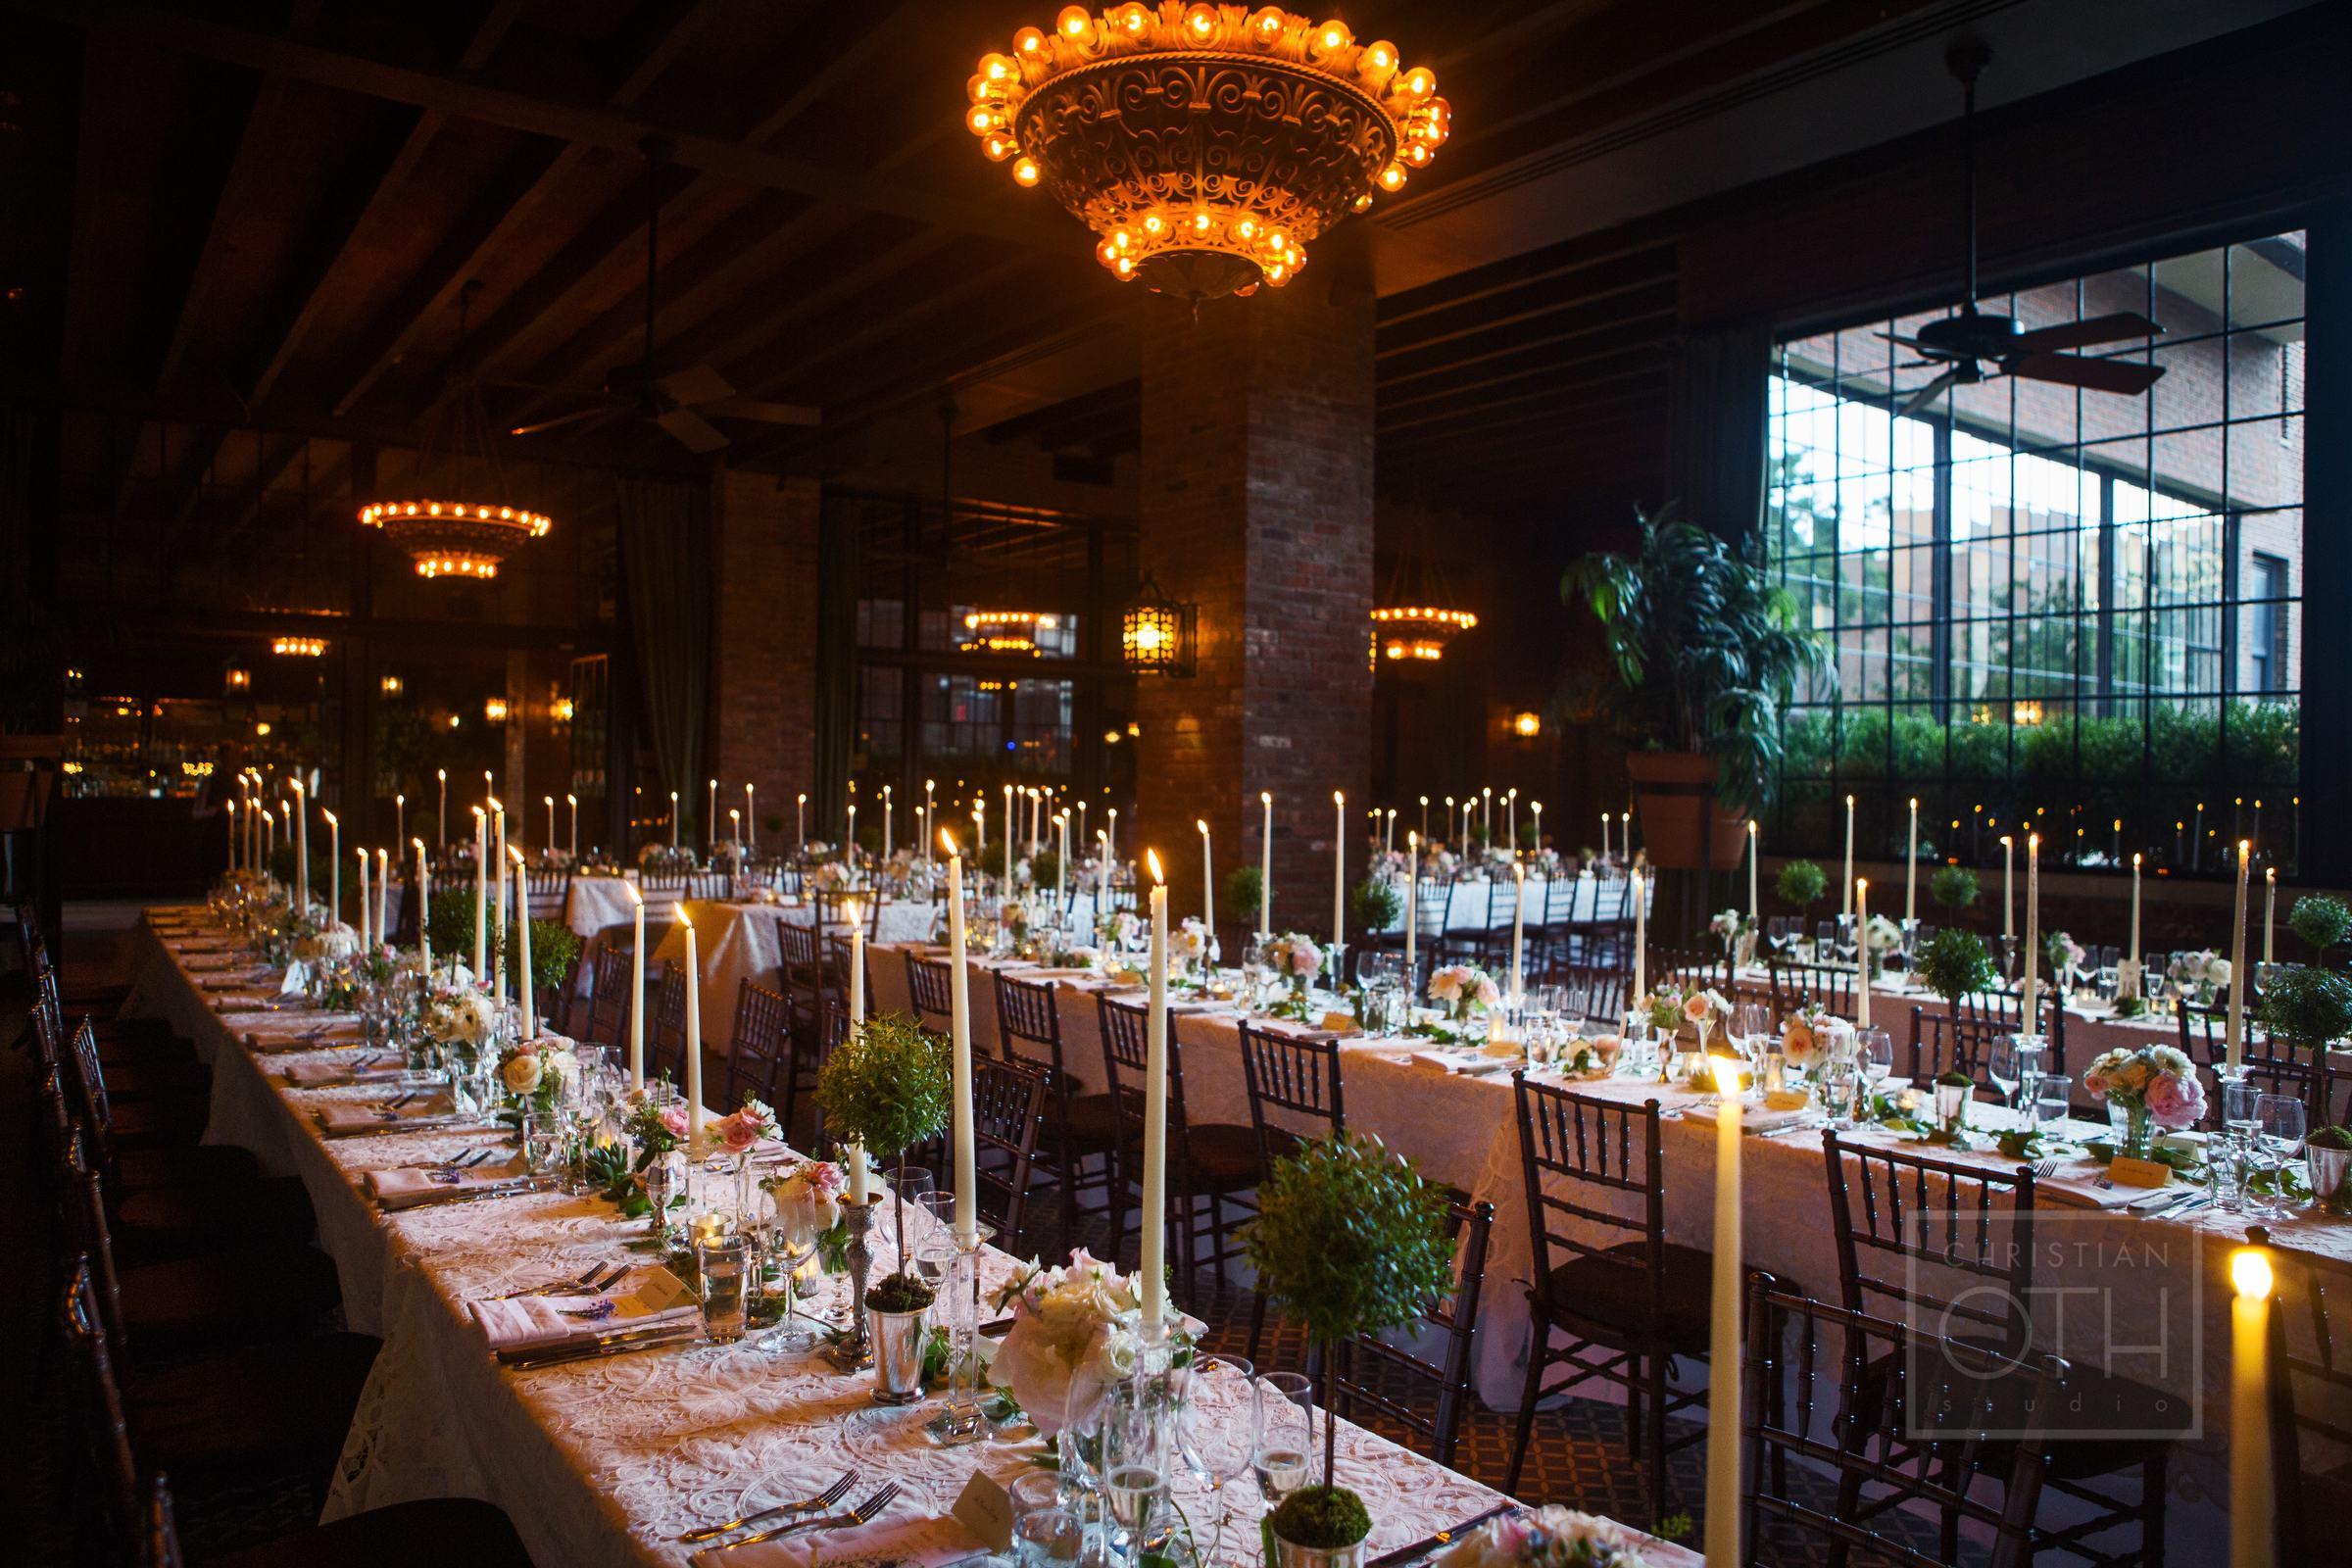 Bowery Hotel Wedding Reception photo by Christian Oth